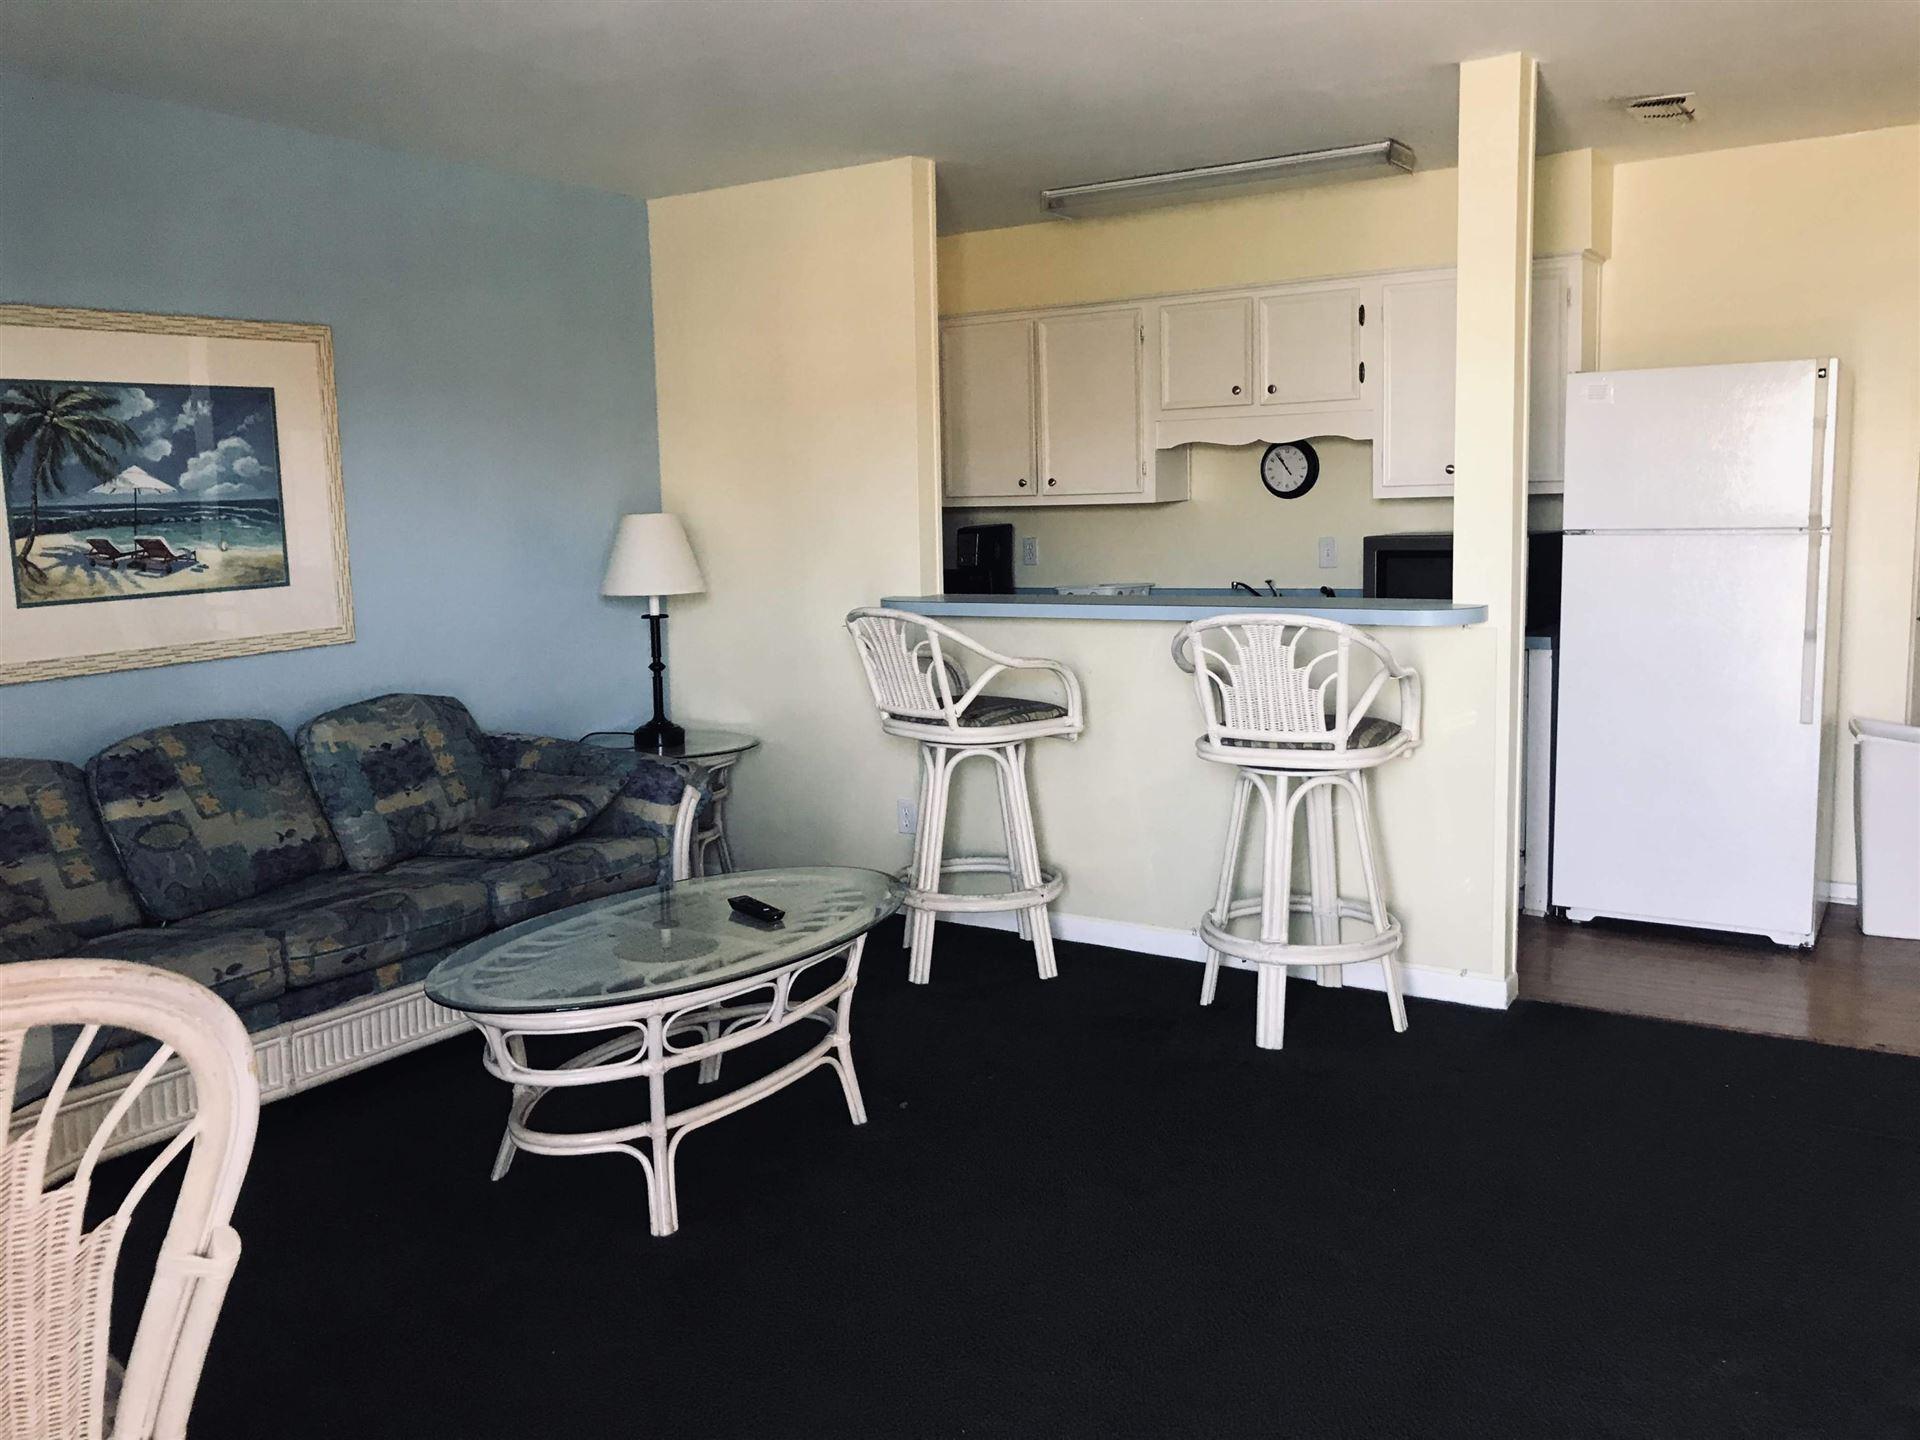 Photo for 312 Bream Avenue #UNIT 106, Fort Walton Beach, FL 32548 (MLS # 818268)